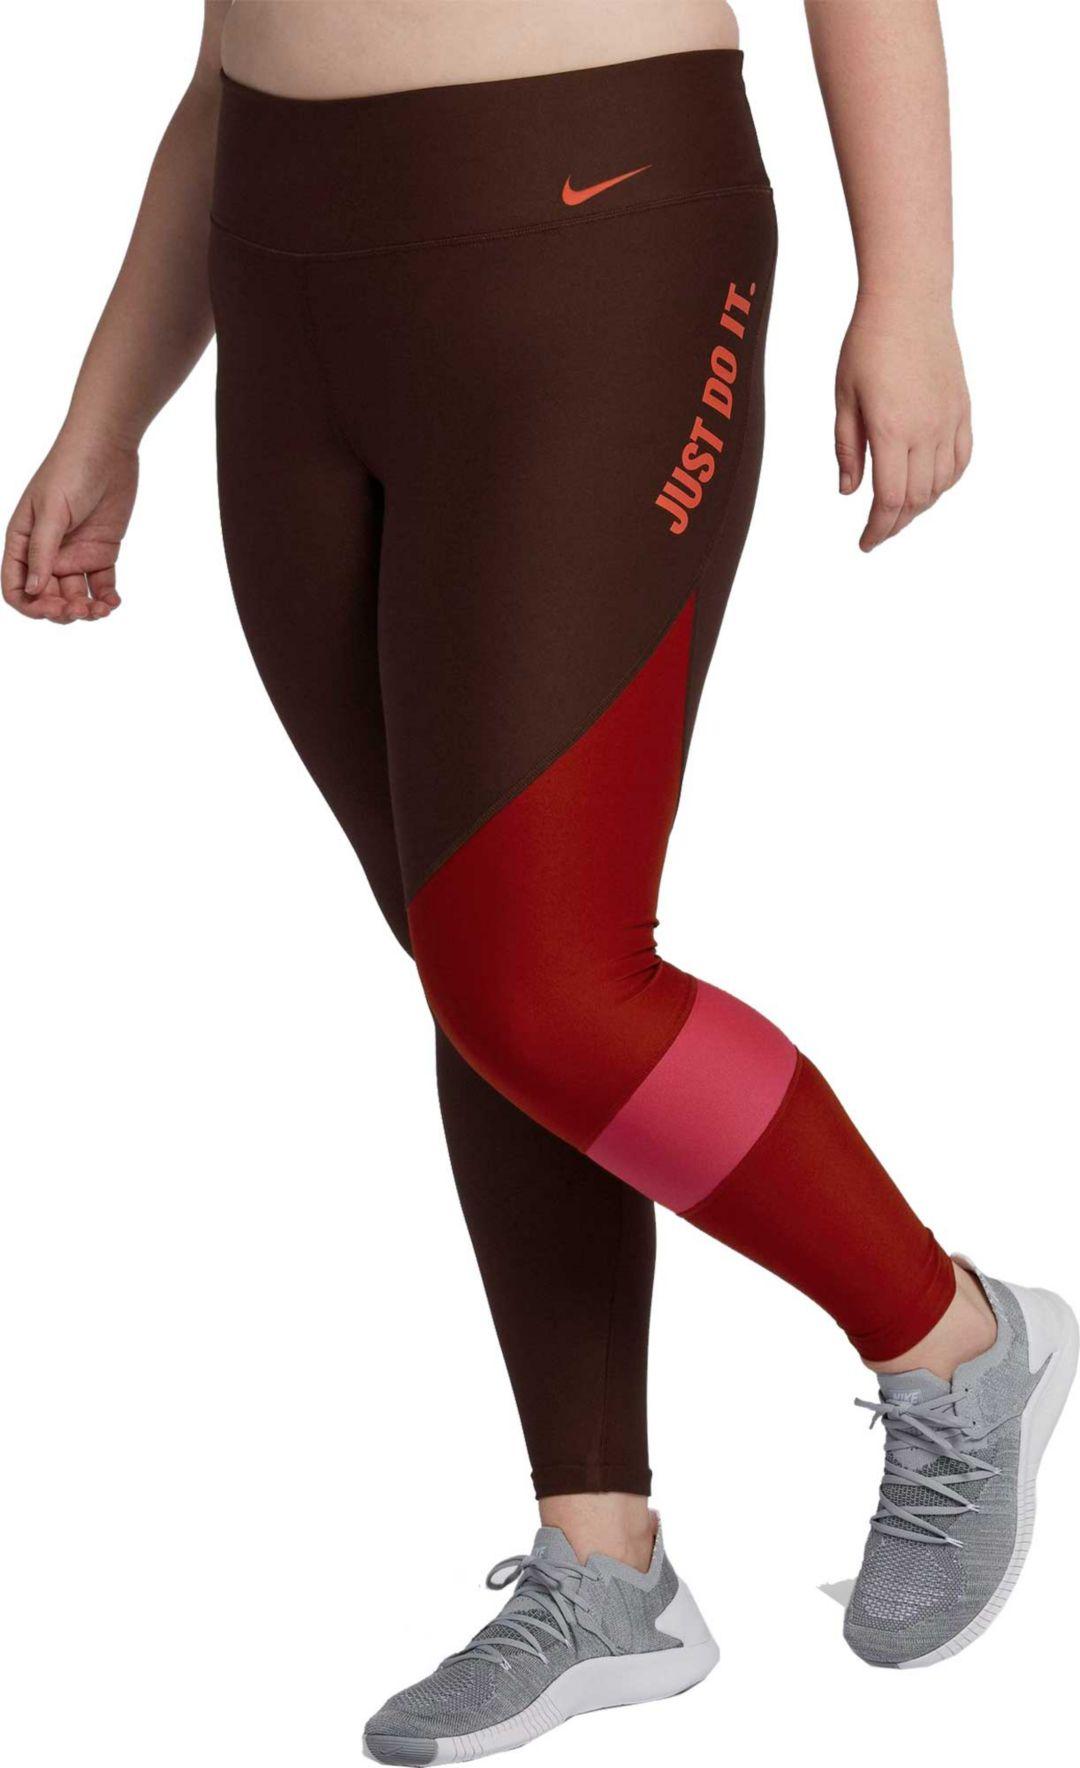 ca5216f75a4b6 Nike Women's Plus Size Power Team Training Tights. noImageFound. Previous